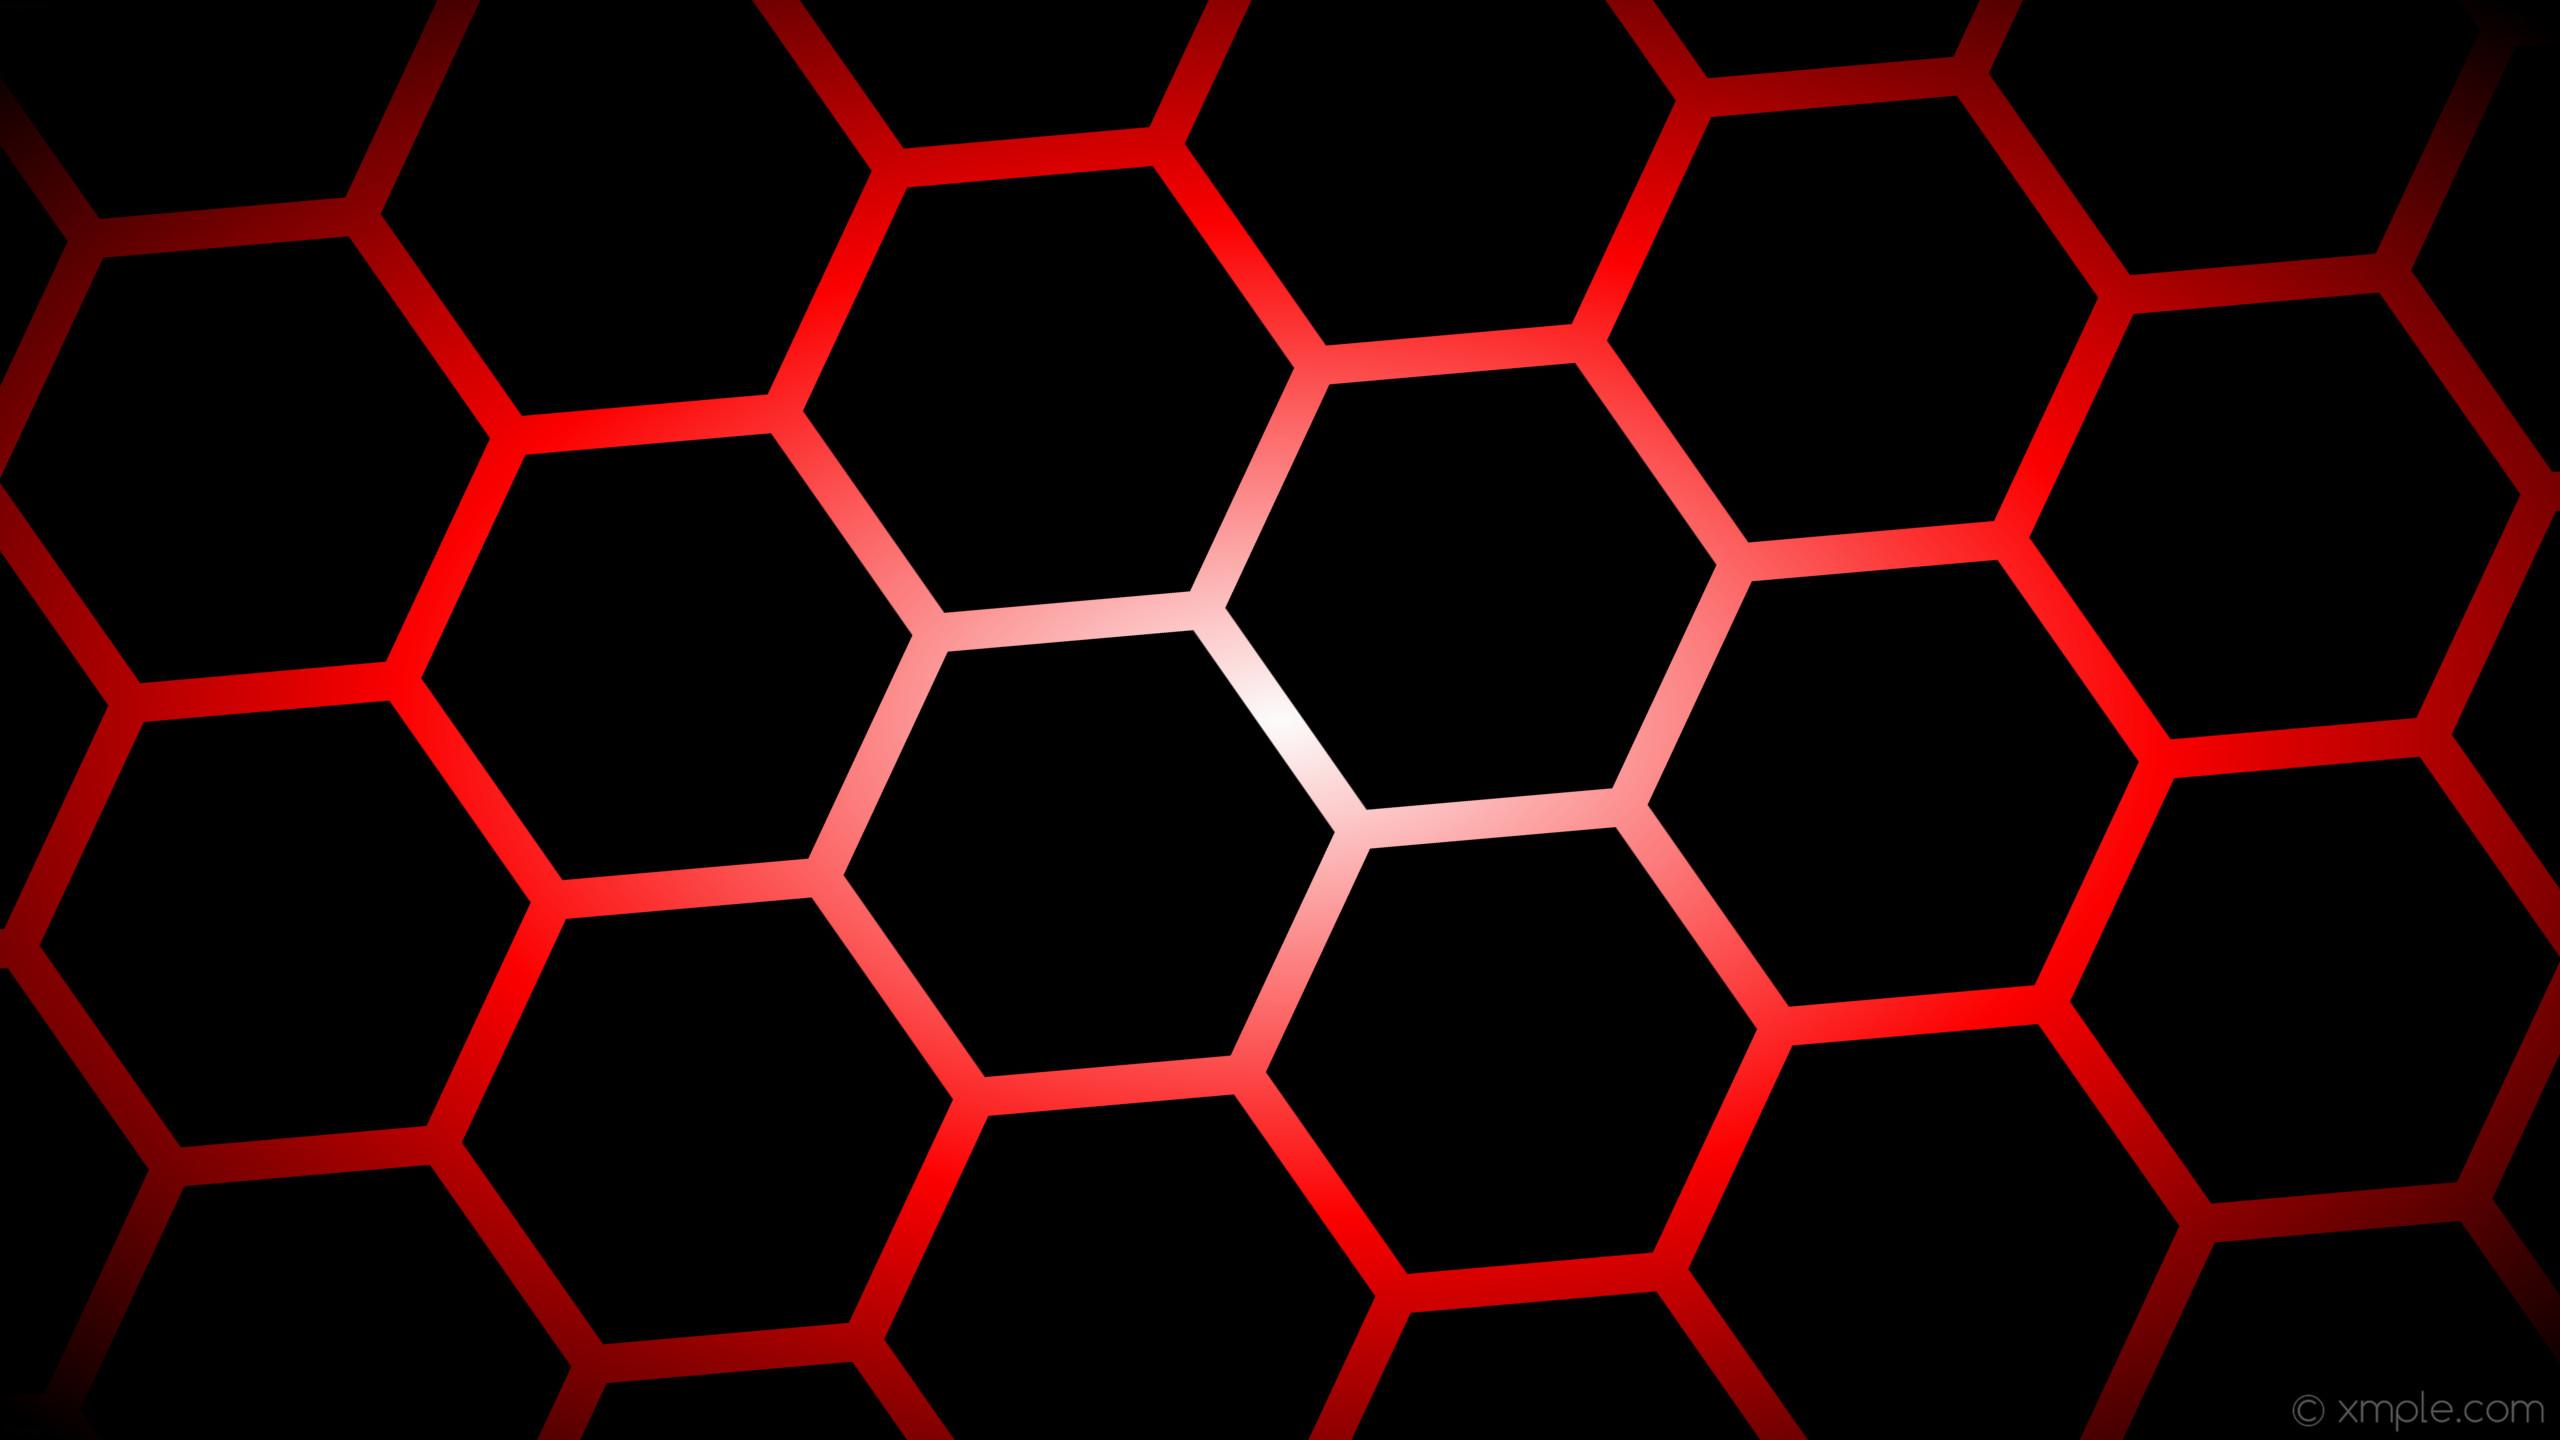 wallpaper black glow hexagon white gradient red #000000 #ffffff #ff0000  diagonal 35°. Wallpaper background black glow hexagon white gradient red  …